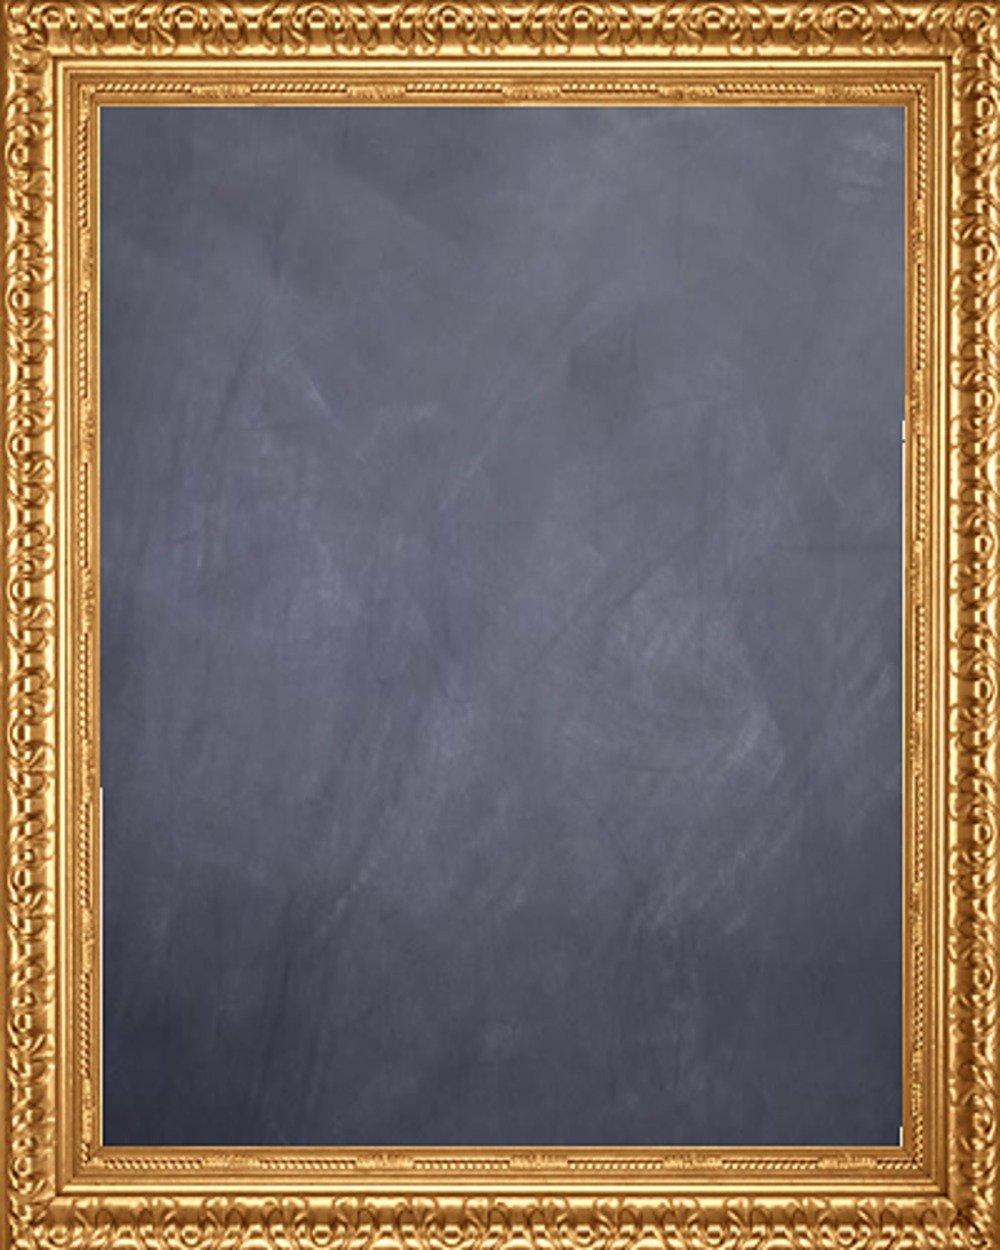 Framed Chalkboard 24'' x 36'' - with Antique Gold Finish Frame